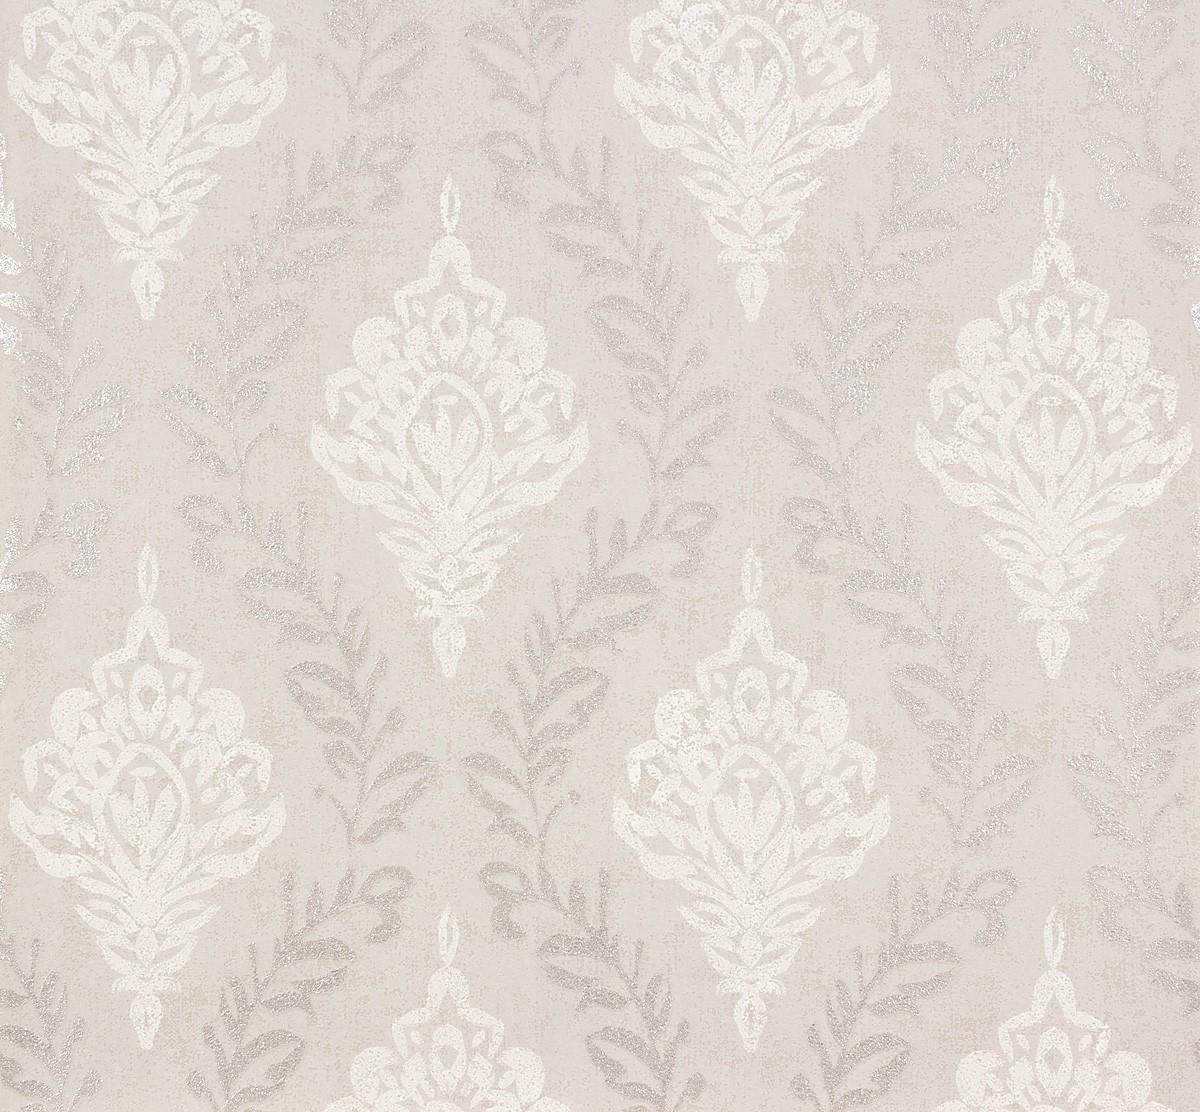 vliestapete grau silber barock visio erismann 6949 37 2. Black Bedroom Furniture Sets. Home Design Ideas